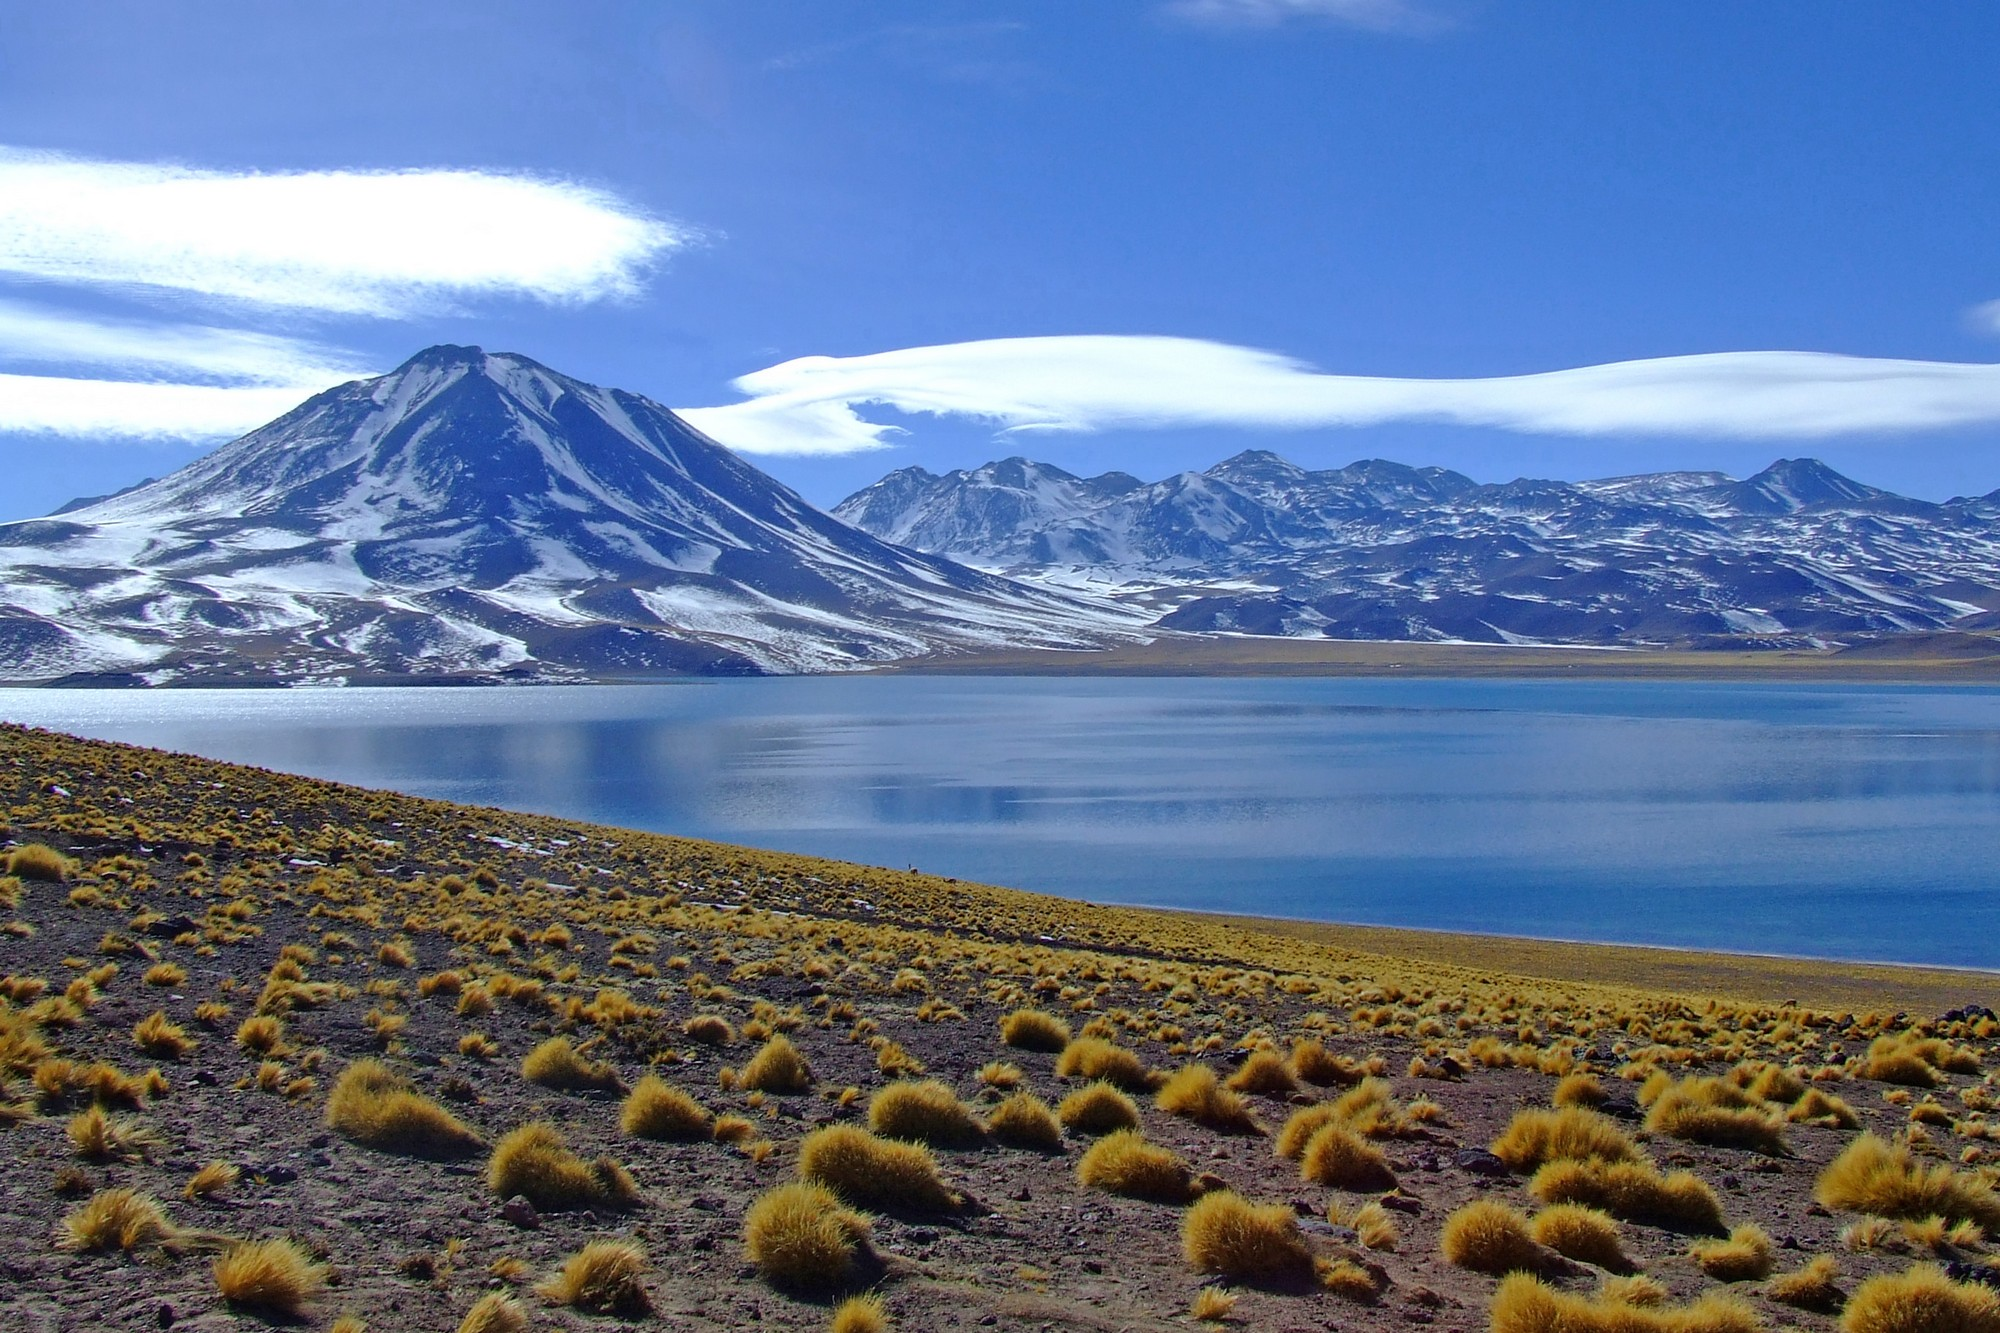 lagunas-altiplanicas-volcan-y-laguna-miscanti-2k